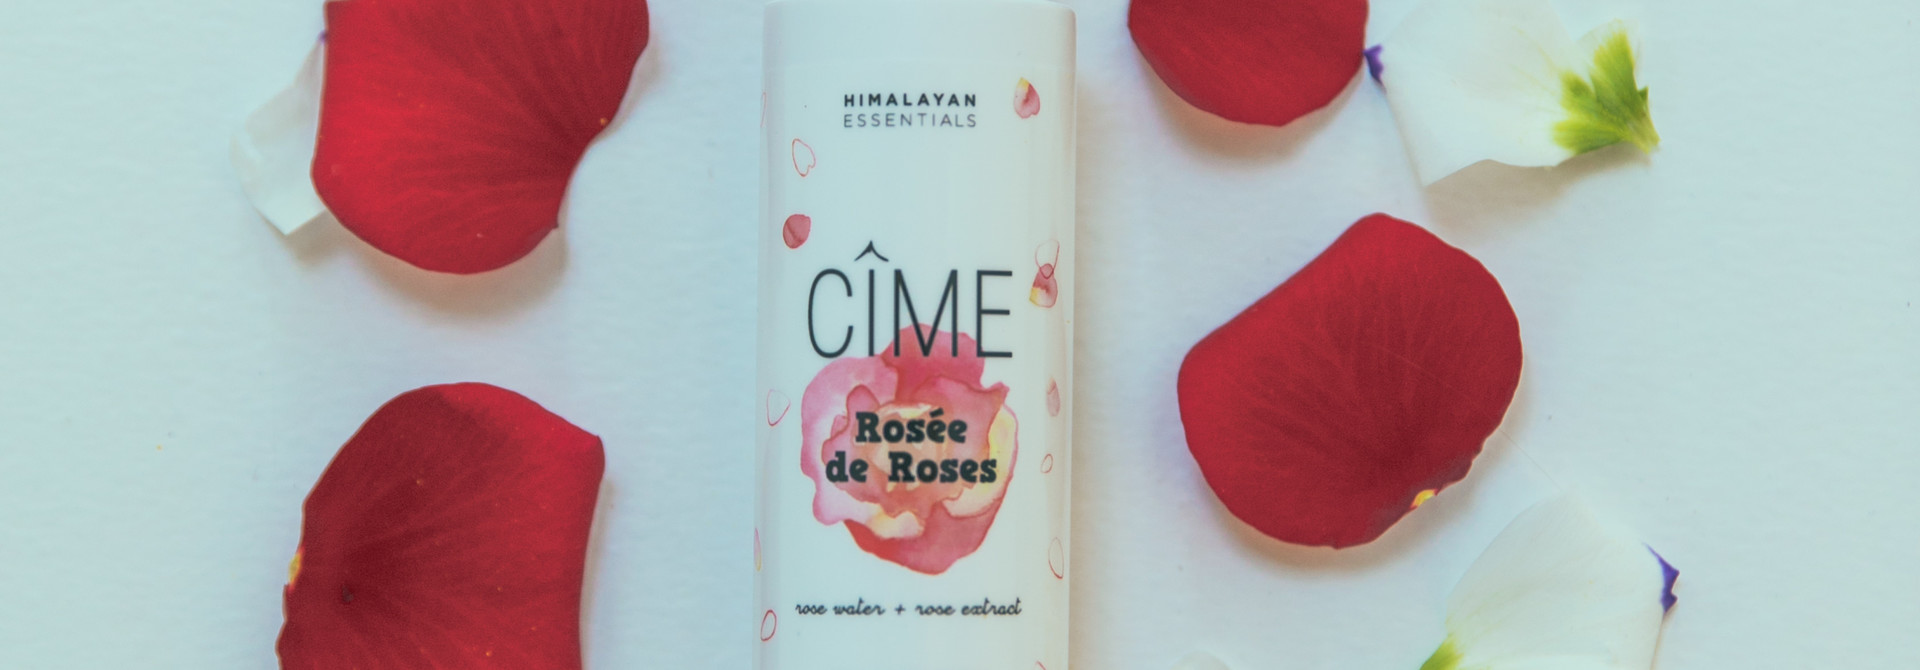 Micellaire Reinigingslotion 3-in-1 Rosée de Roses